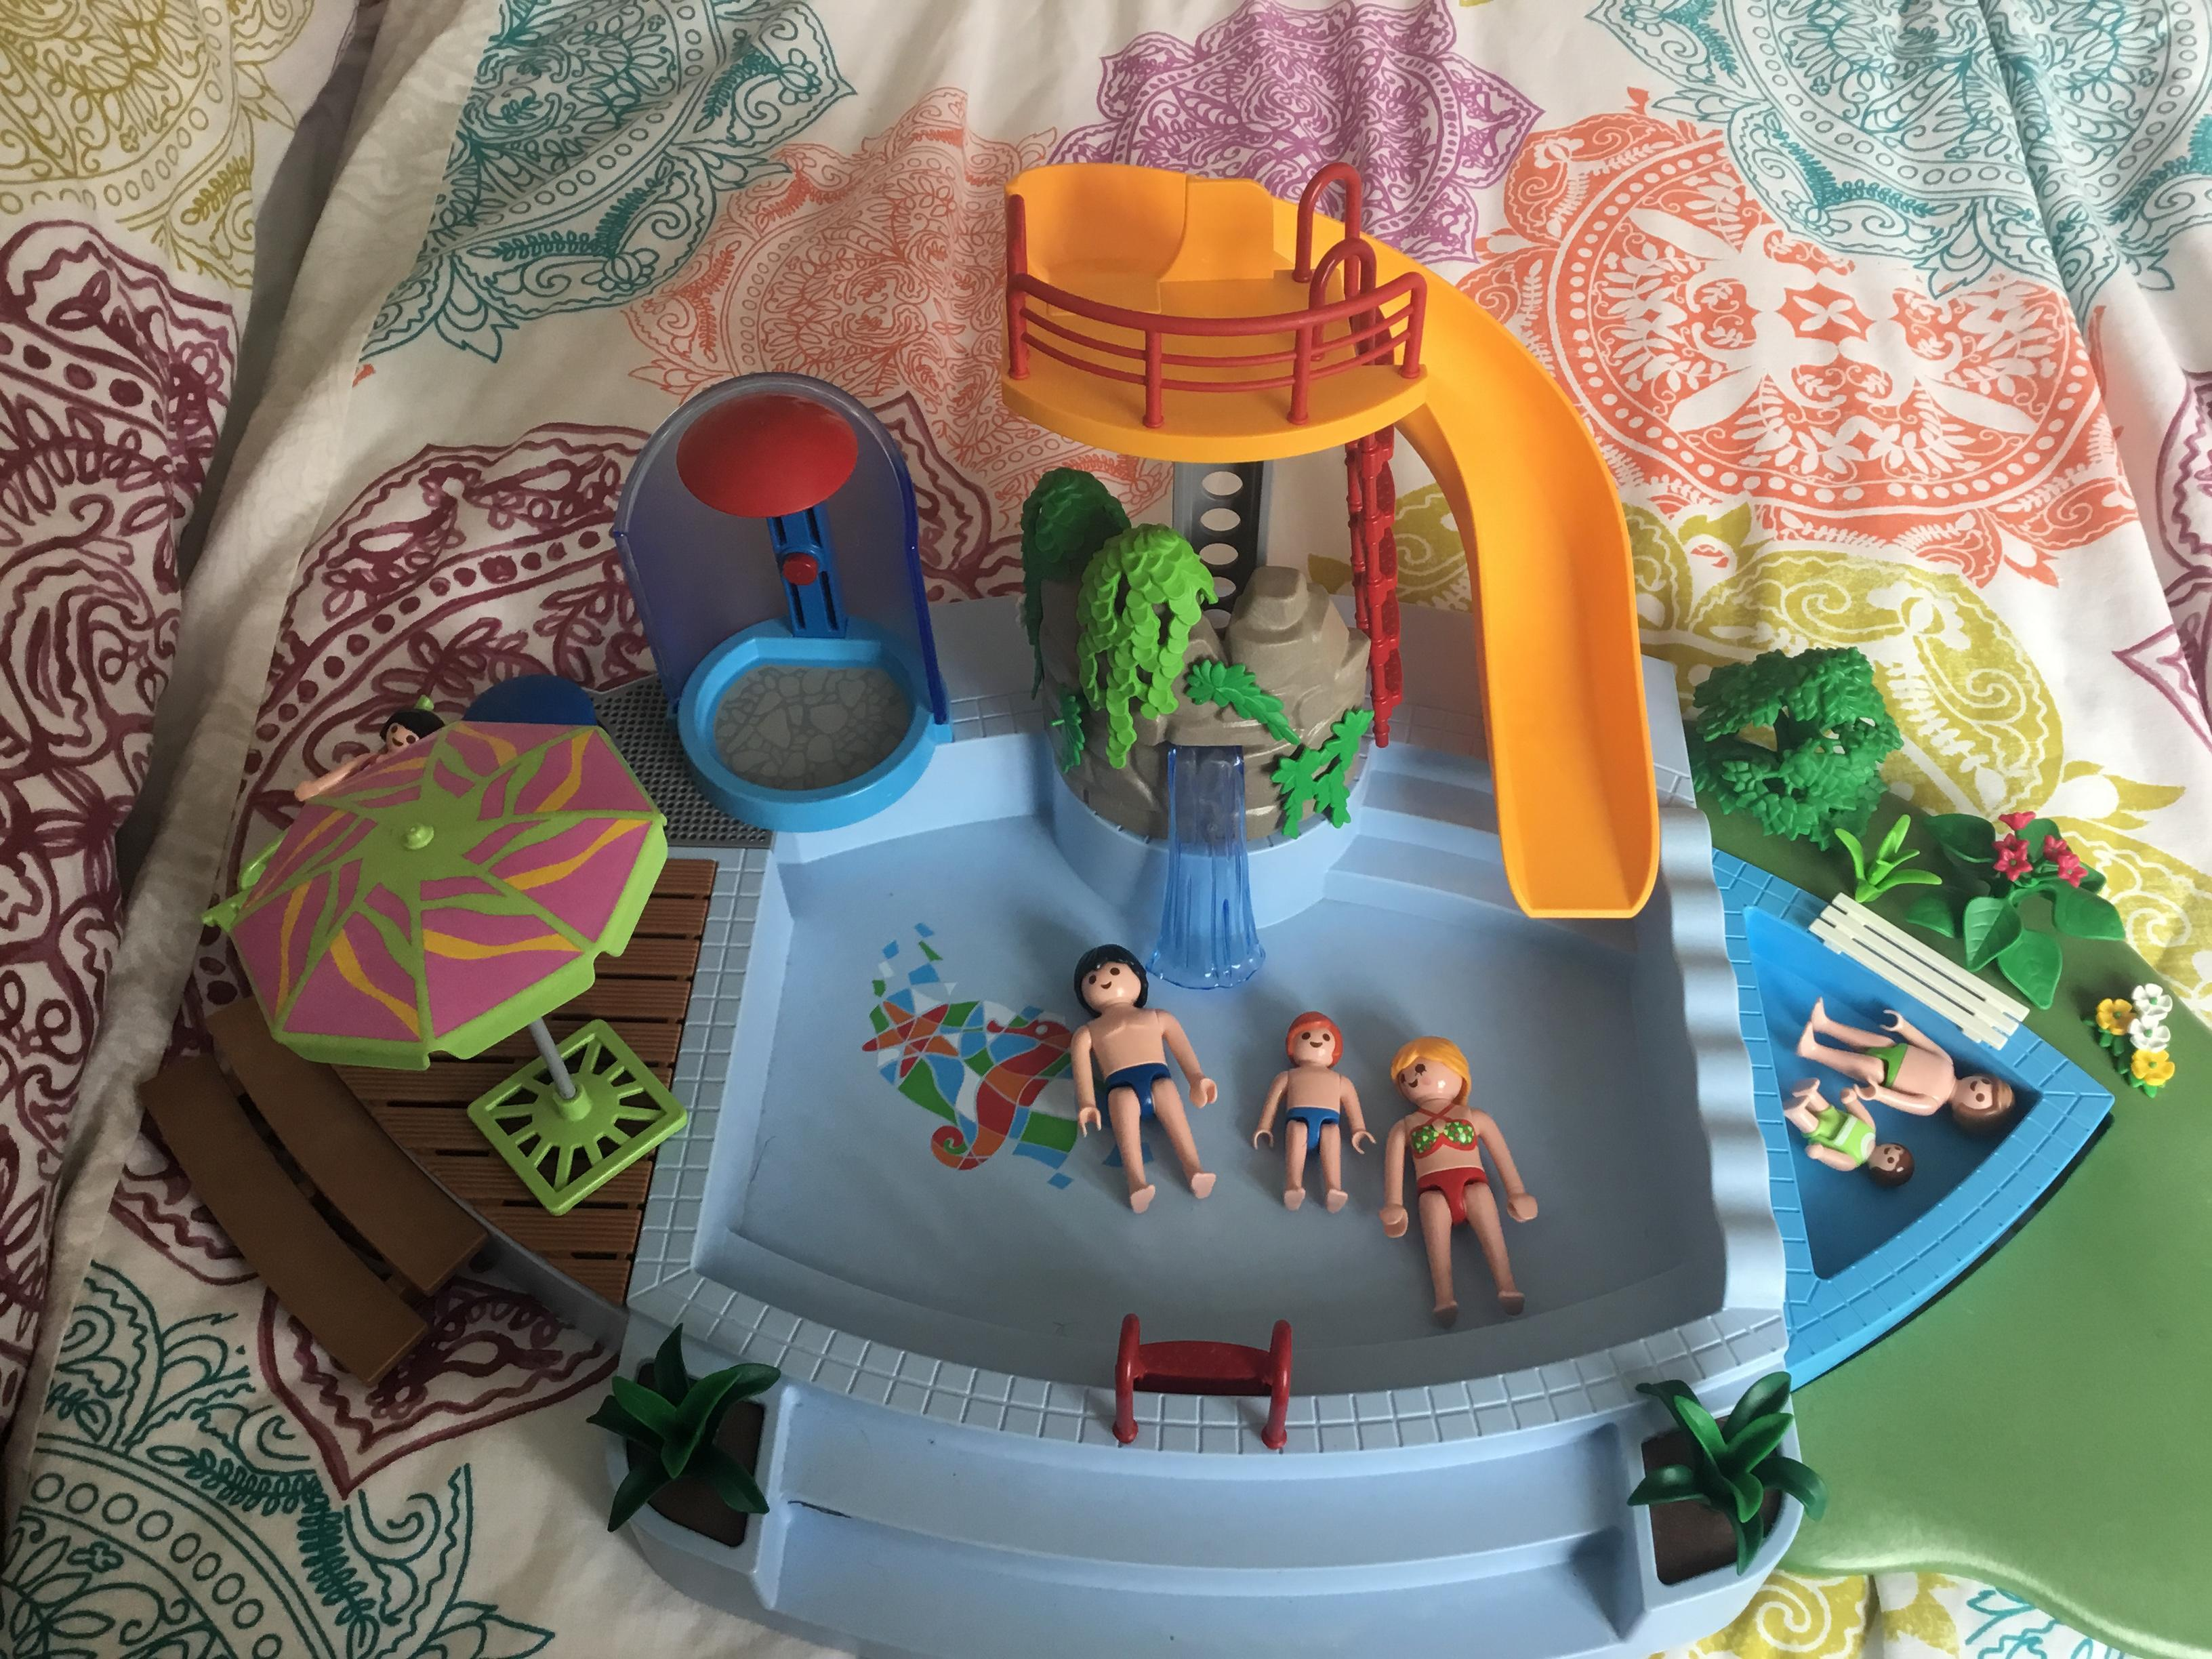 Playmobil swimming pool and park